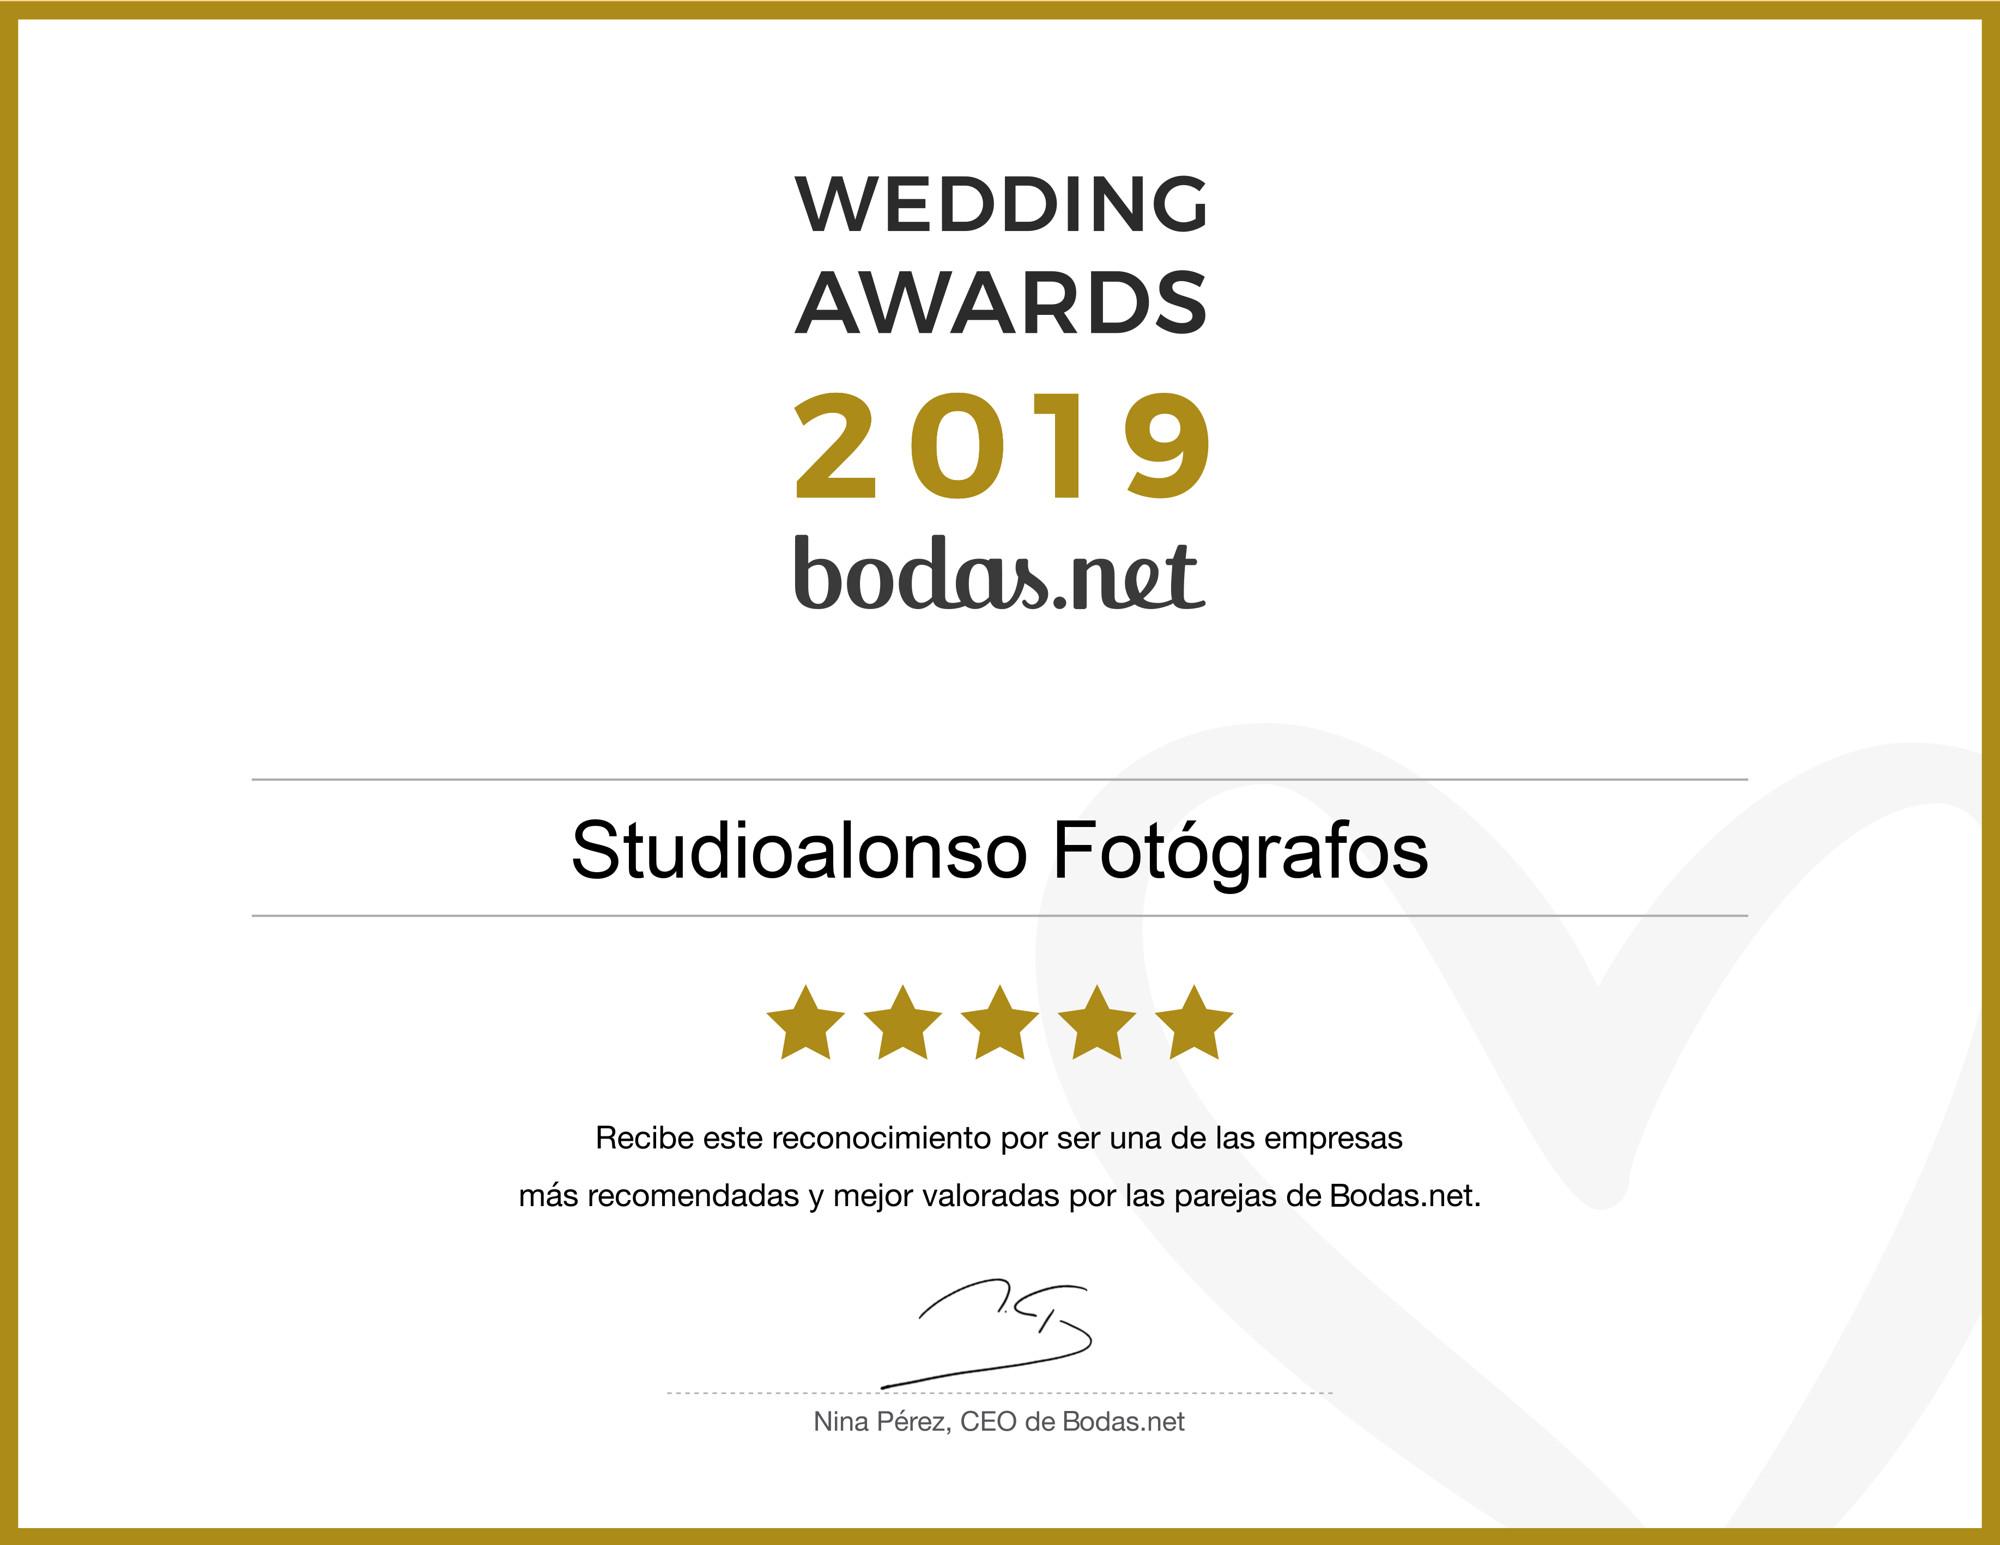 premio mejores fotografos bodasnet madrid